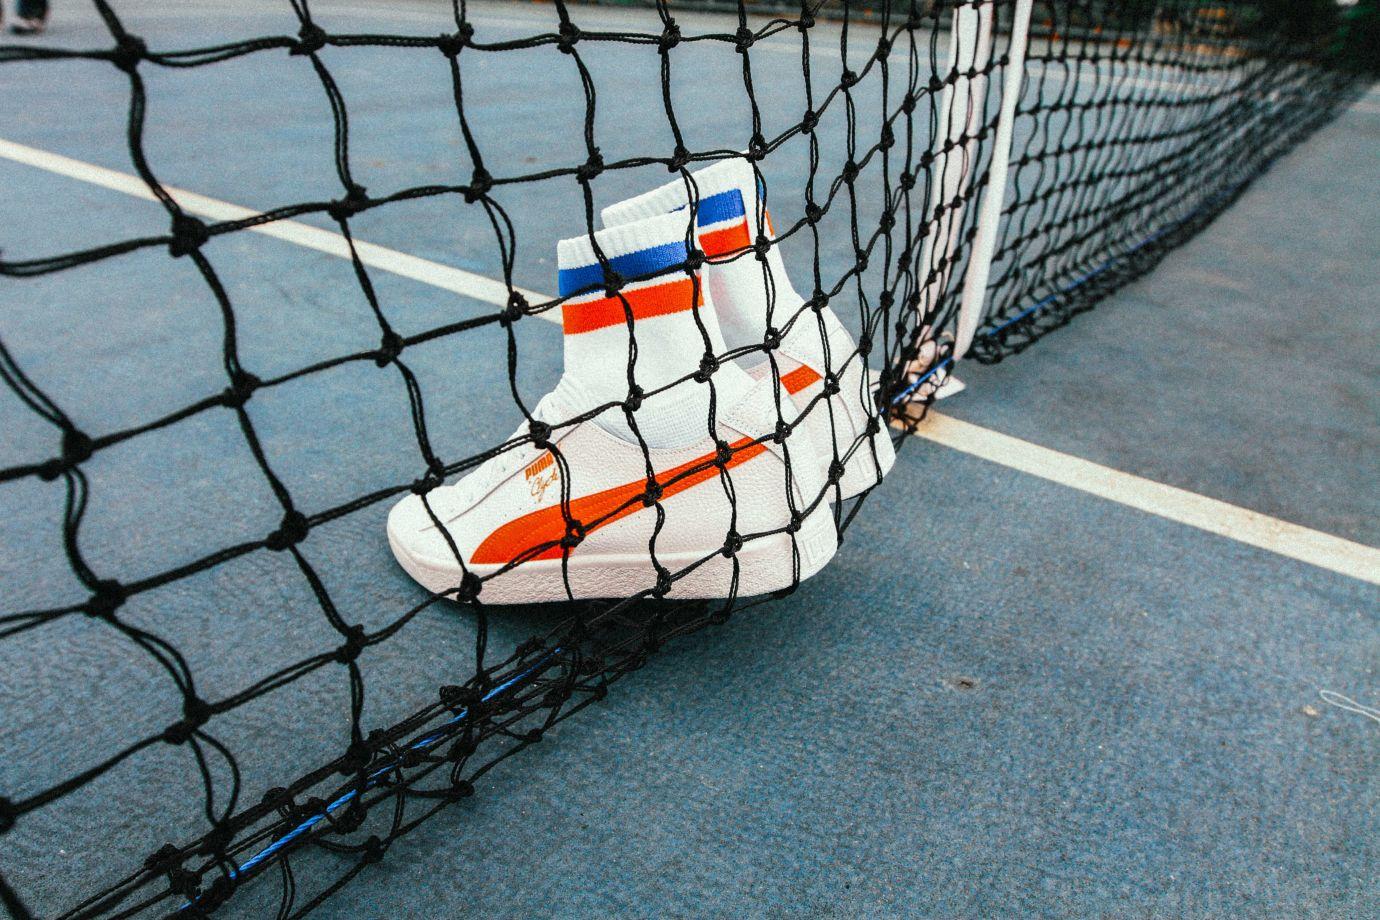 Puma Sneaker an ein Netz gelehnt